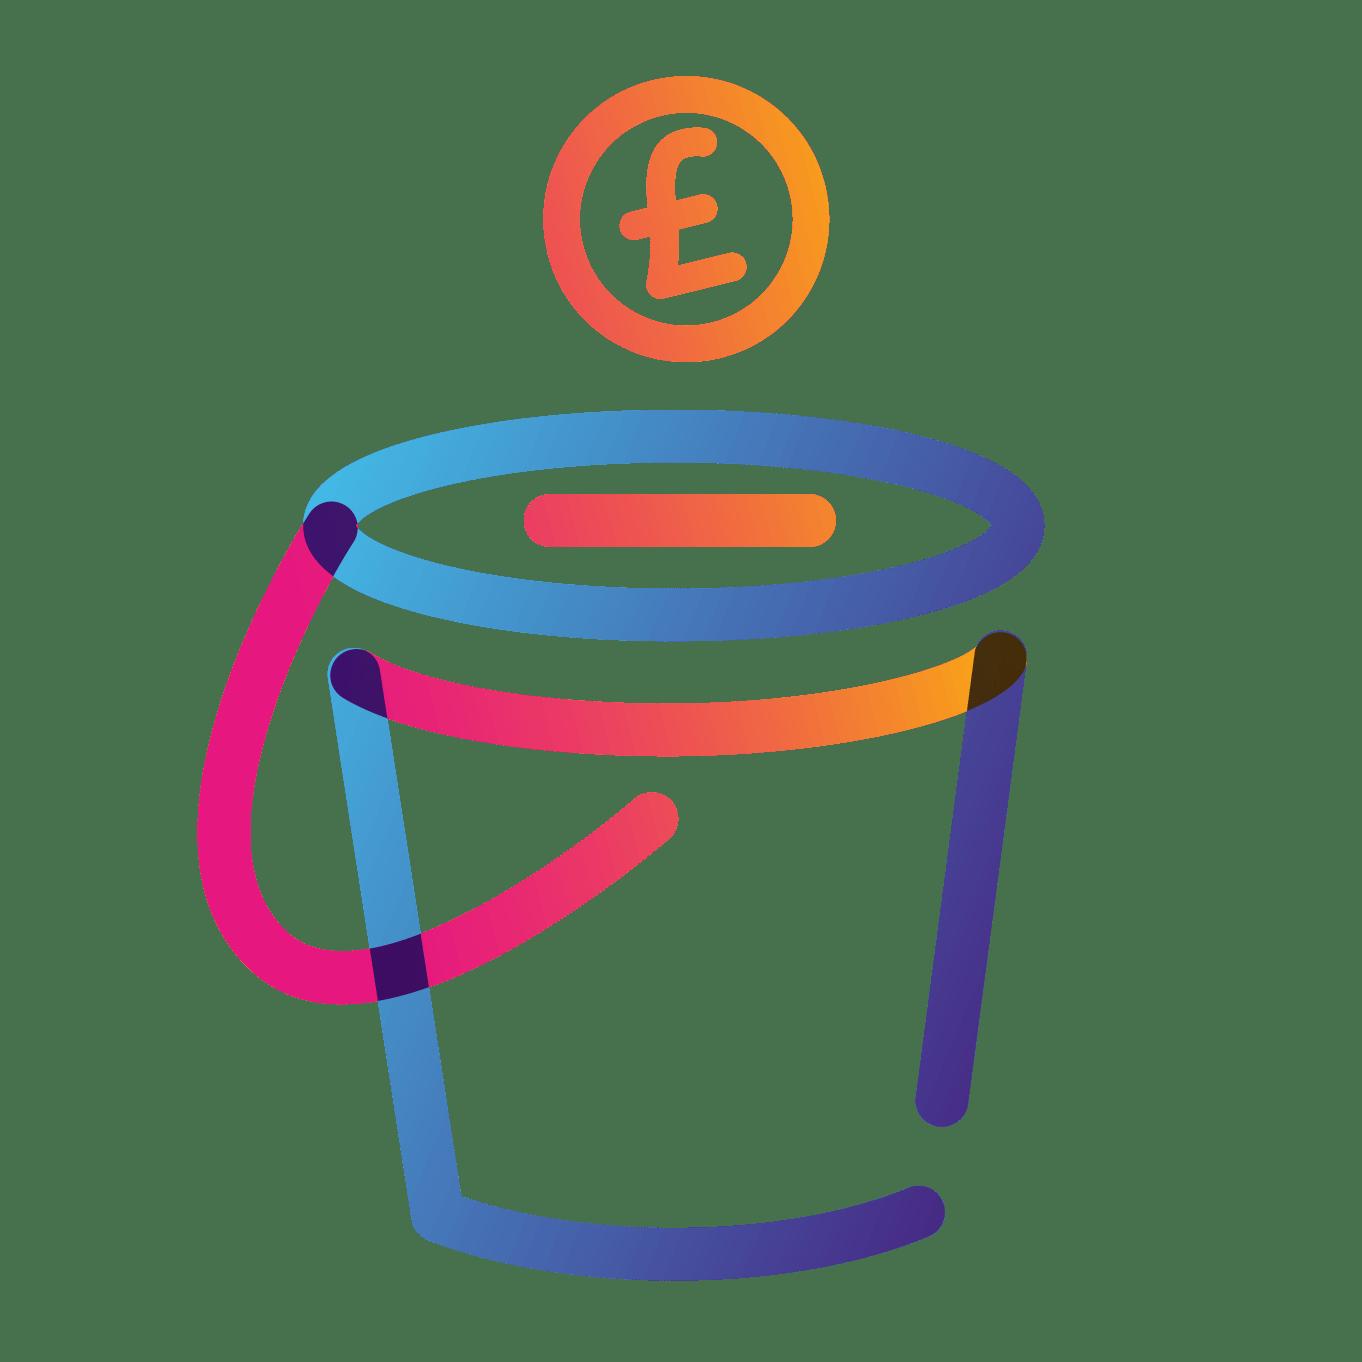 fundraising bucket icon